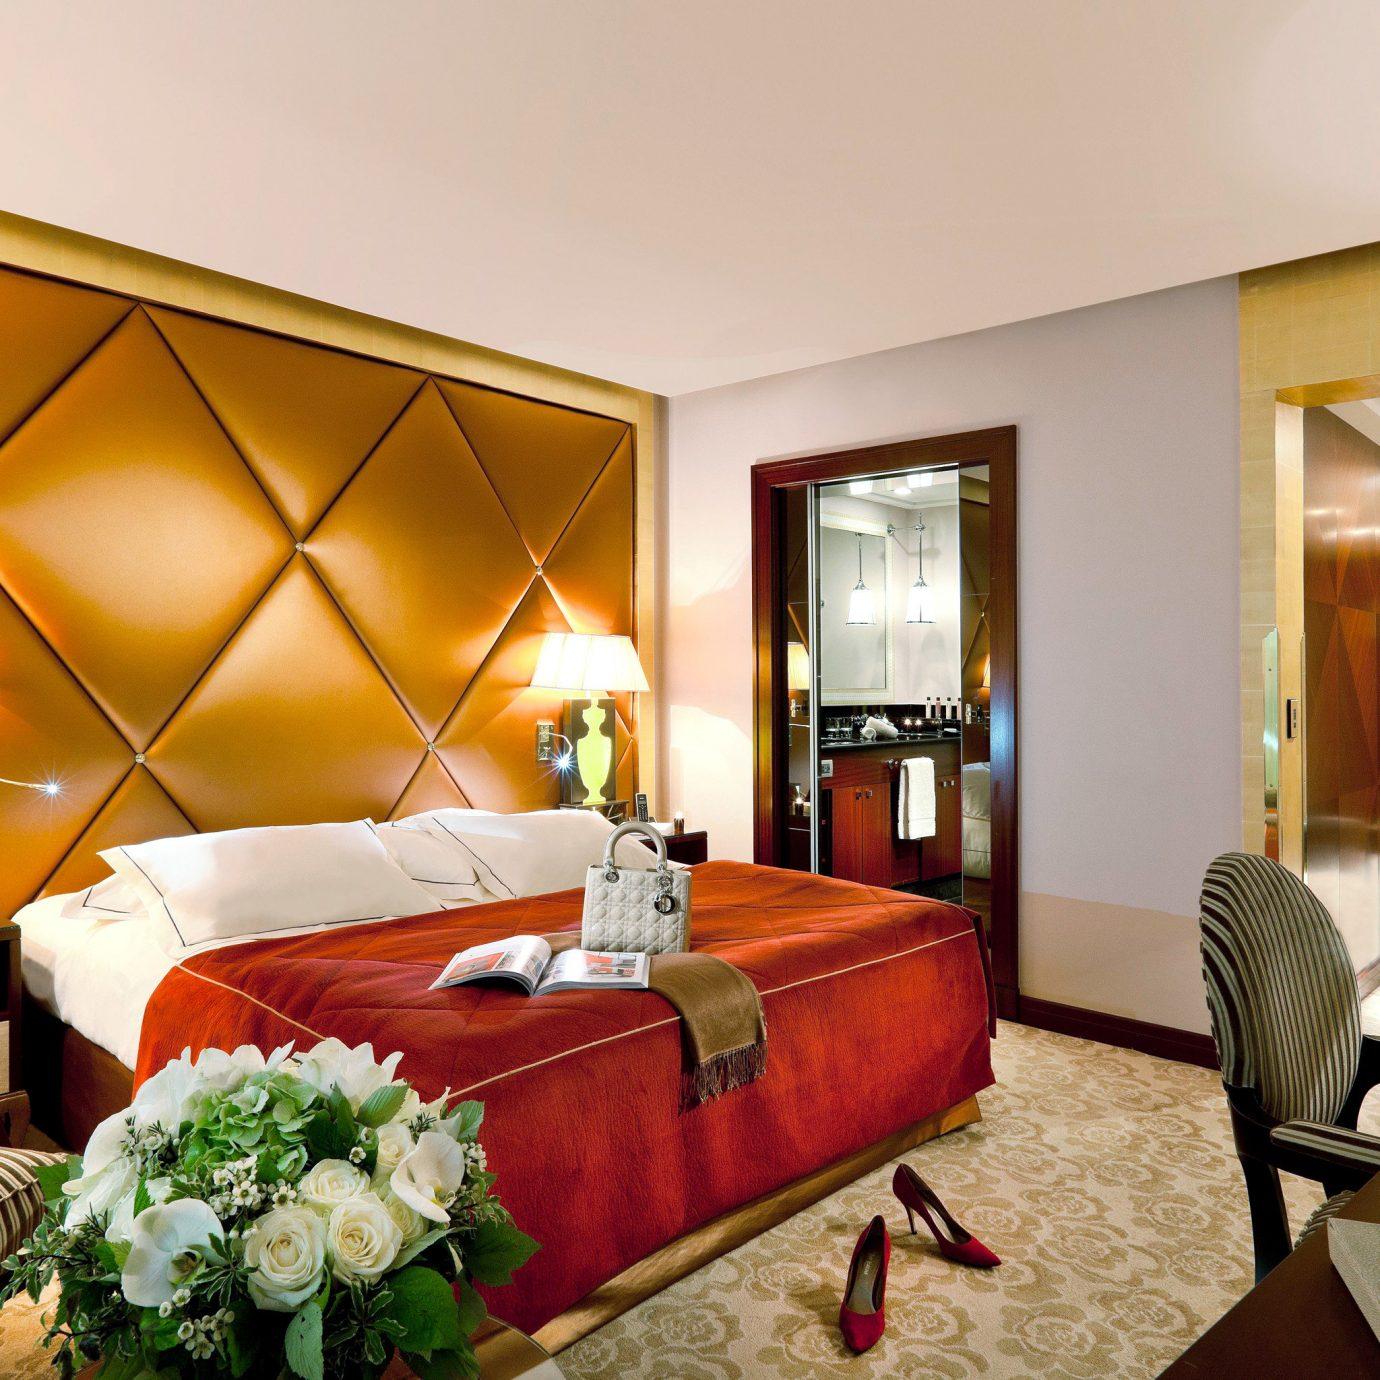 Bedroom Luxury Modern Romantic Suite sofa property living room Resort Villa condominium cottage flat